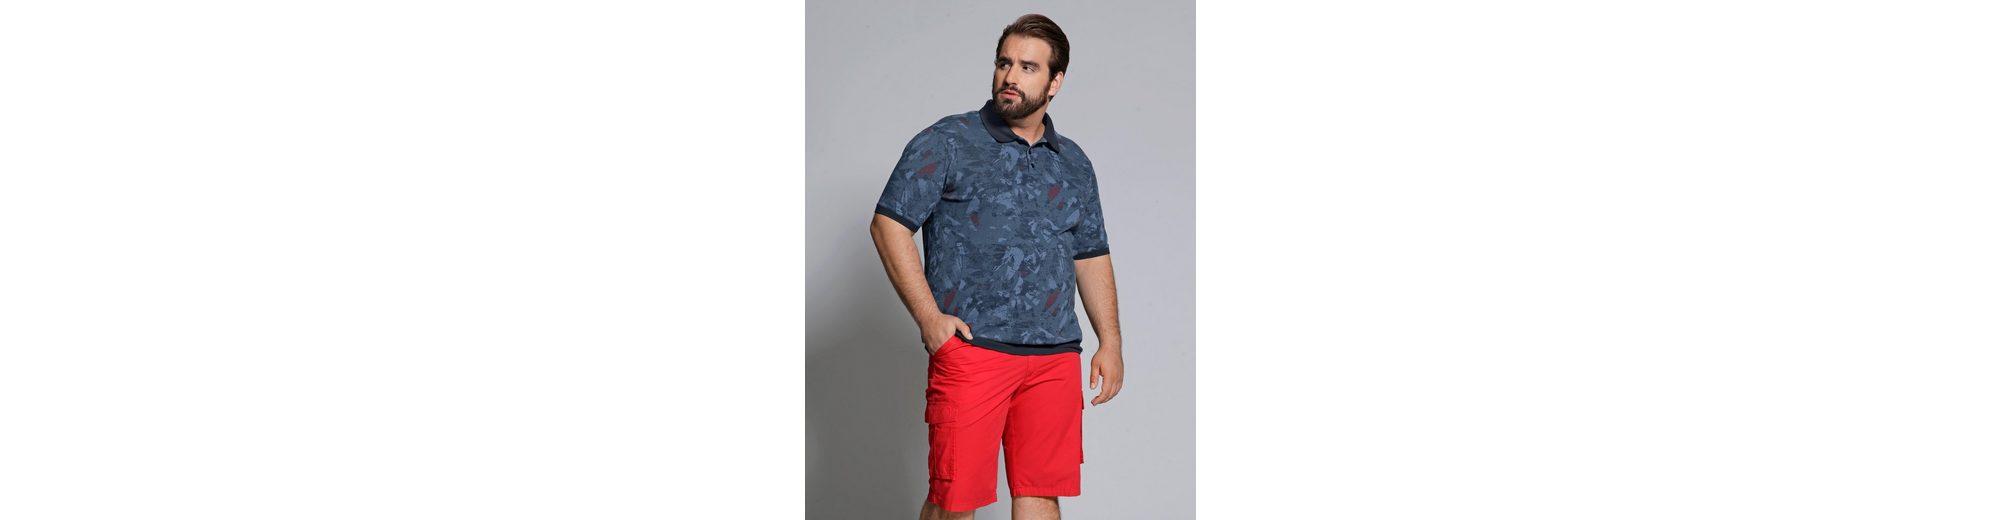 Men Plus by Happy Size Spezial-Bauchschnitt Poloshirt Großhandelspreis Verkauf Online rn4bA